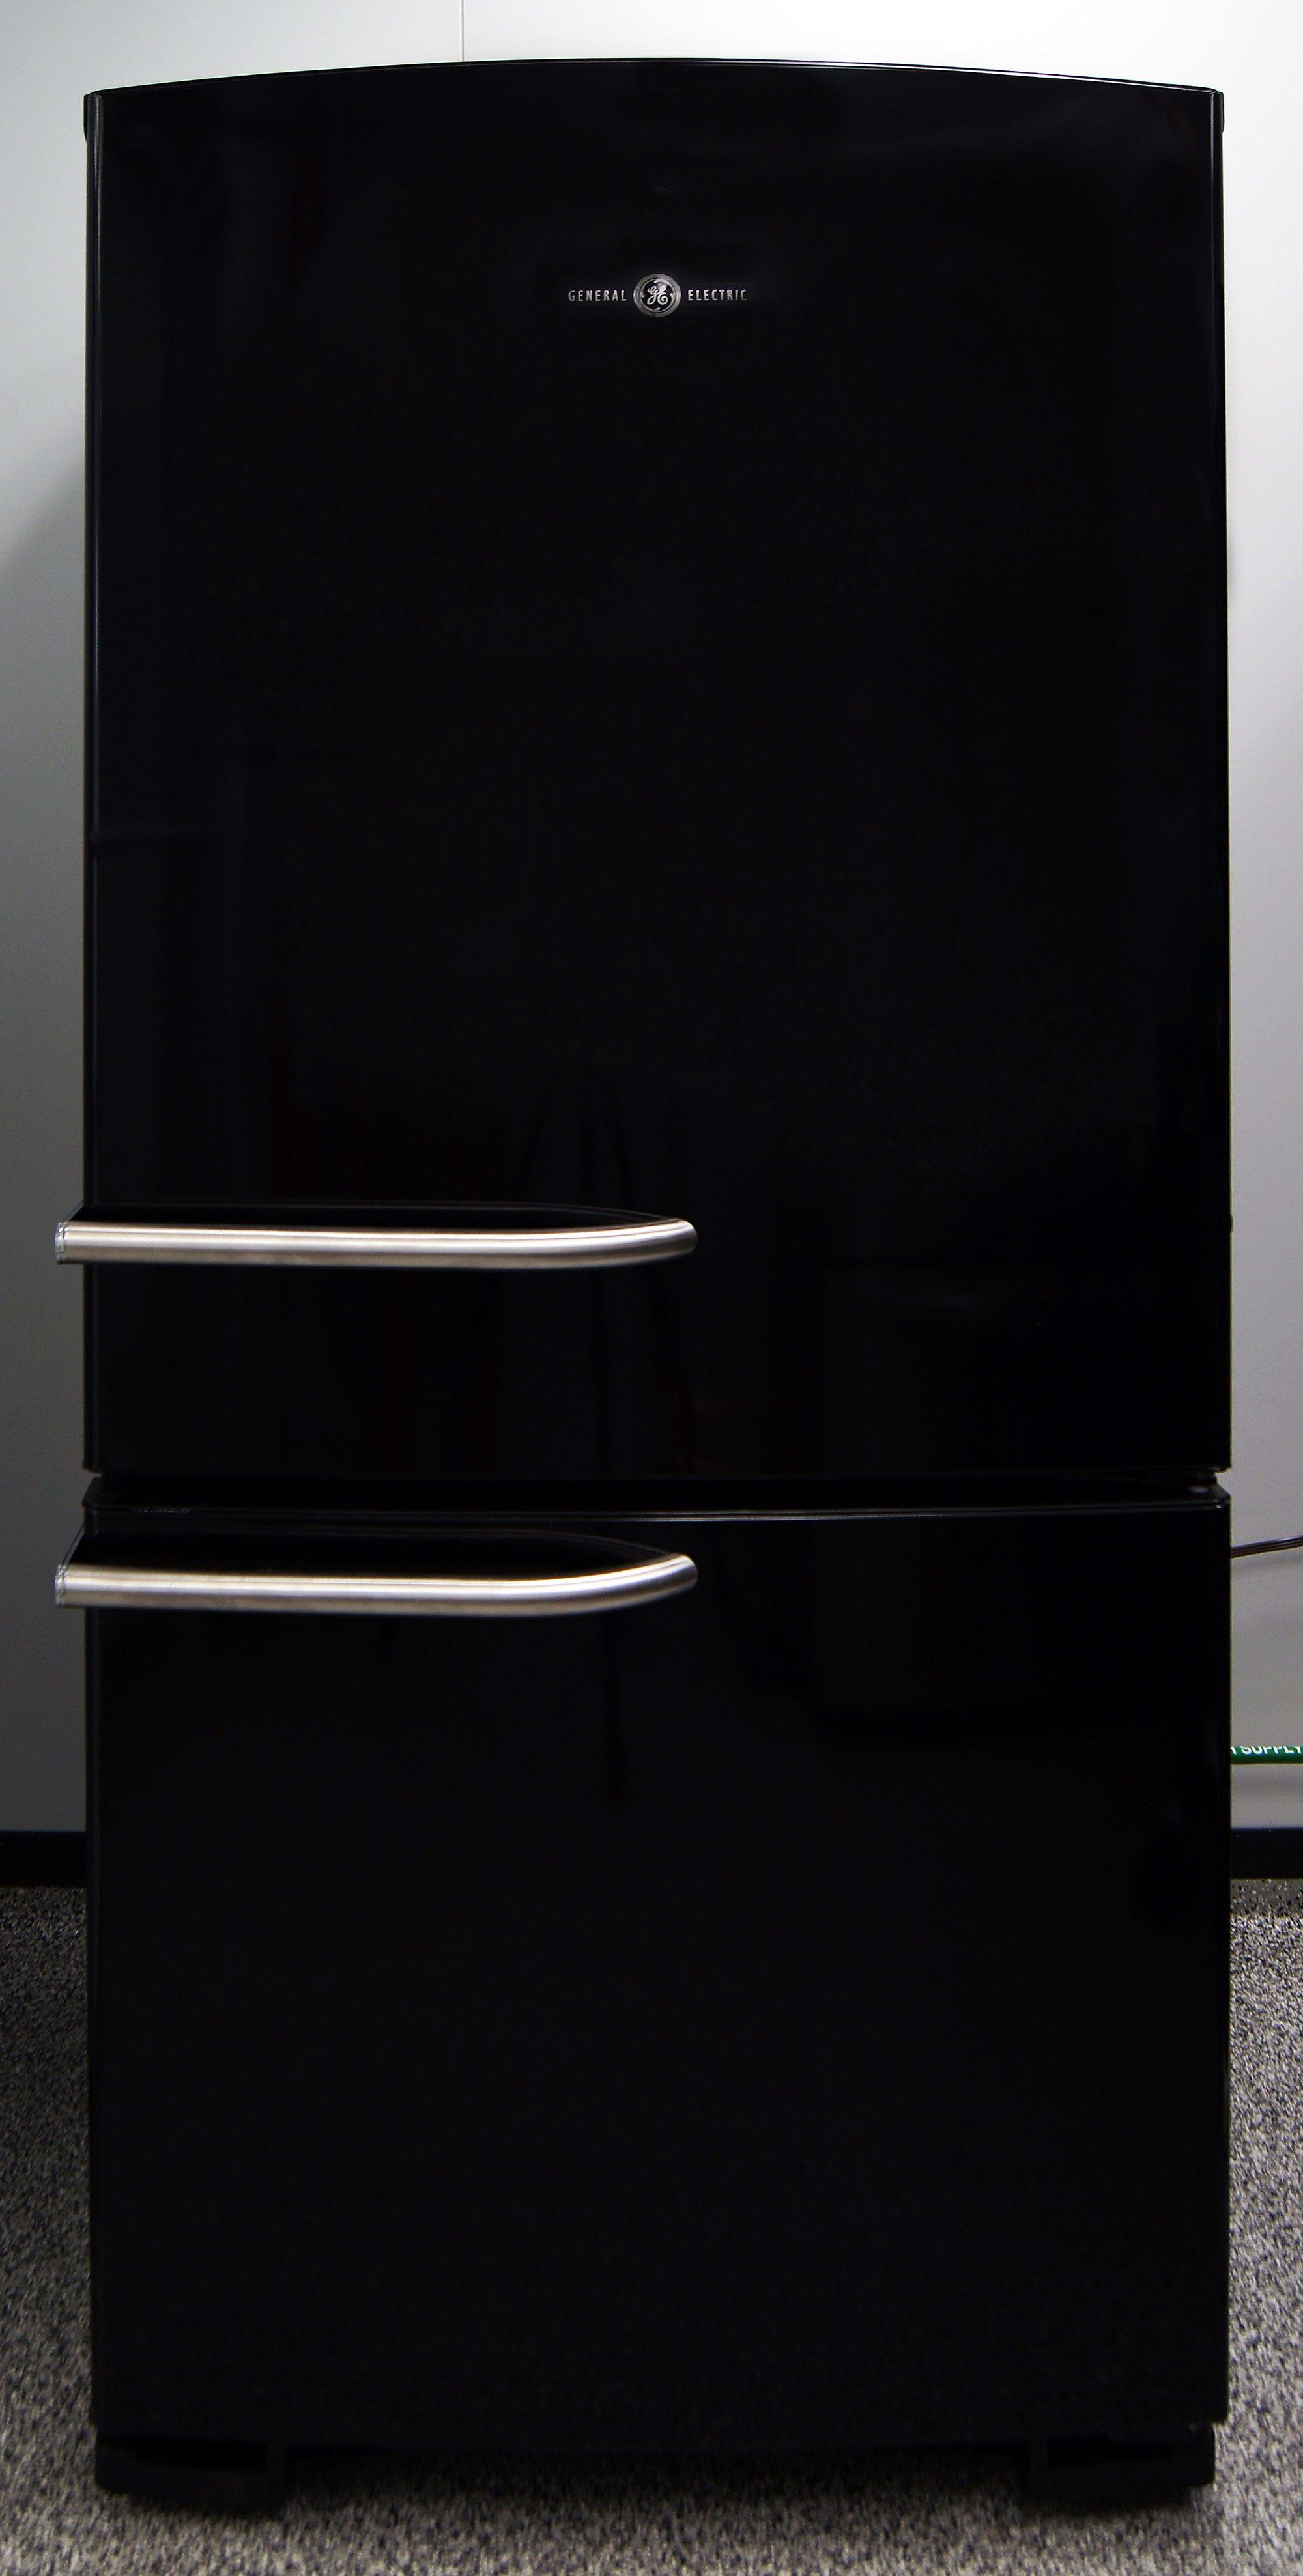 The elegant black GE Artistry ABE20EGEBS combines minimalism with subtle retro elements.